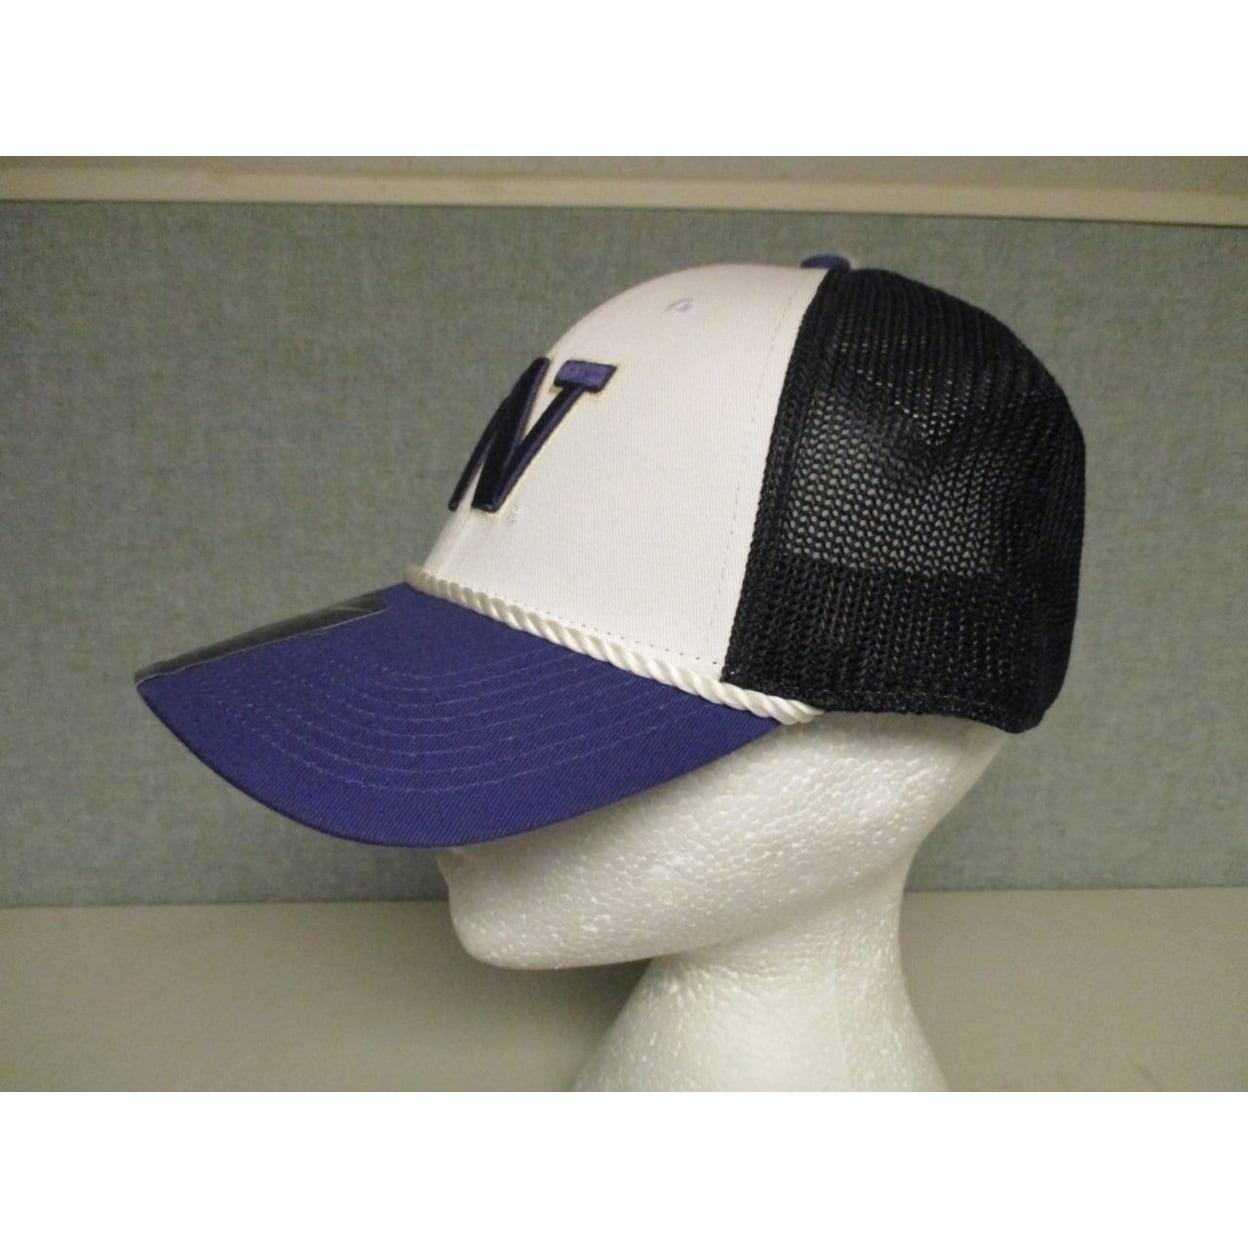 c394bcbeb72 Shop Washington Huskies Mens Unisex Size OSFA Nike Cap Hat 28 - Free  Shipping On Orders Over  45 - Overstock.com - 23065047